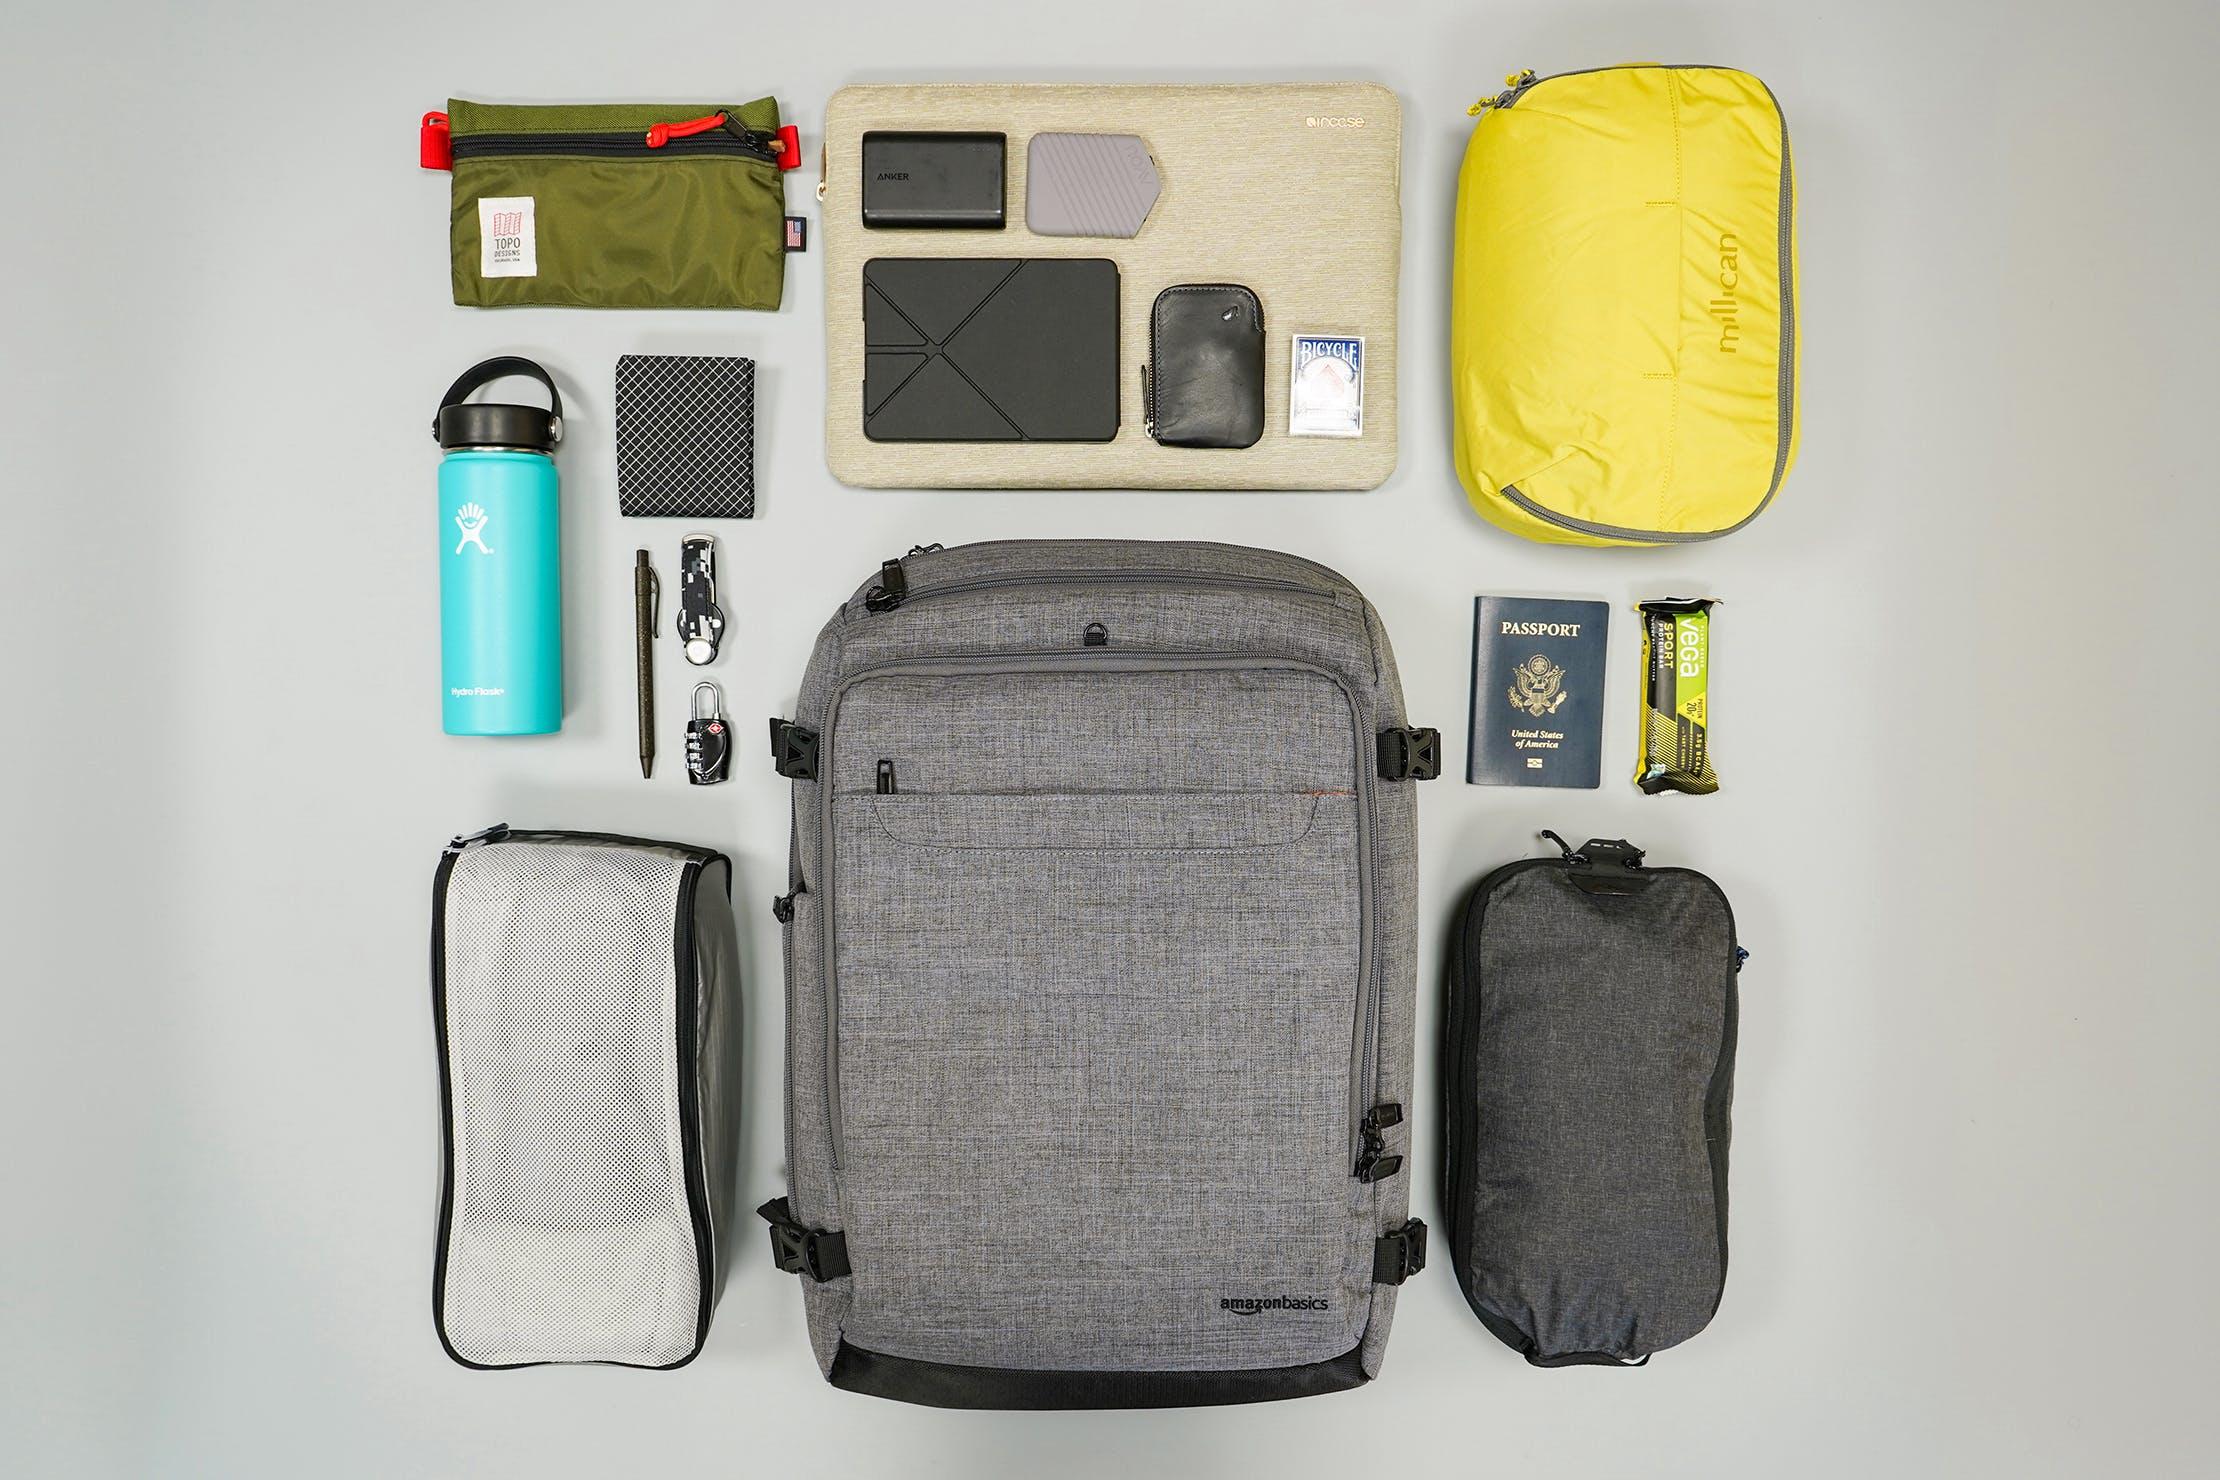 AmazonBasics Slim Travel Backpack Weekender Flat Lay